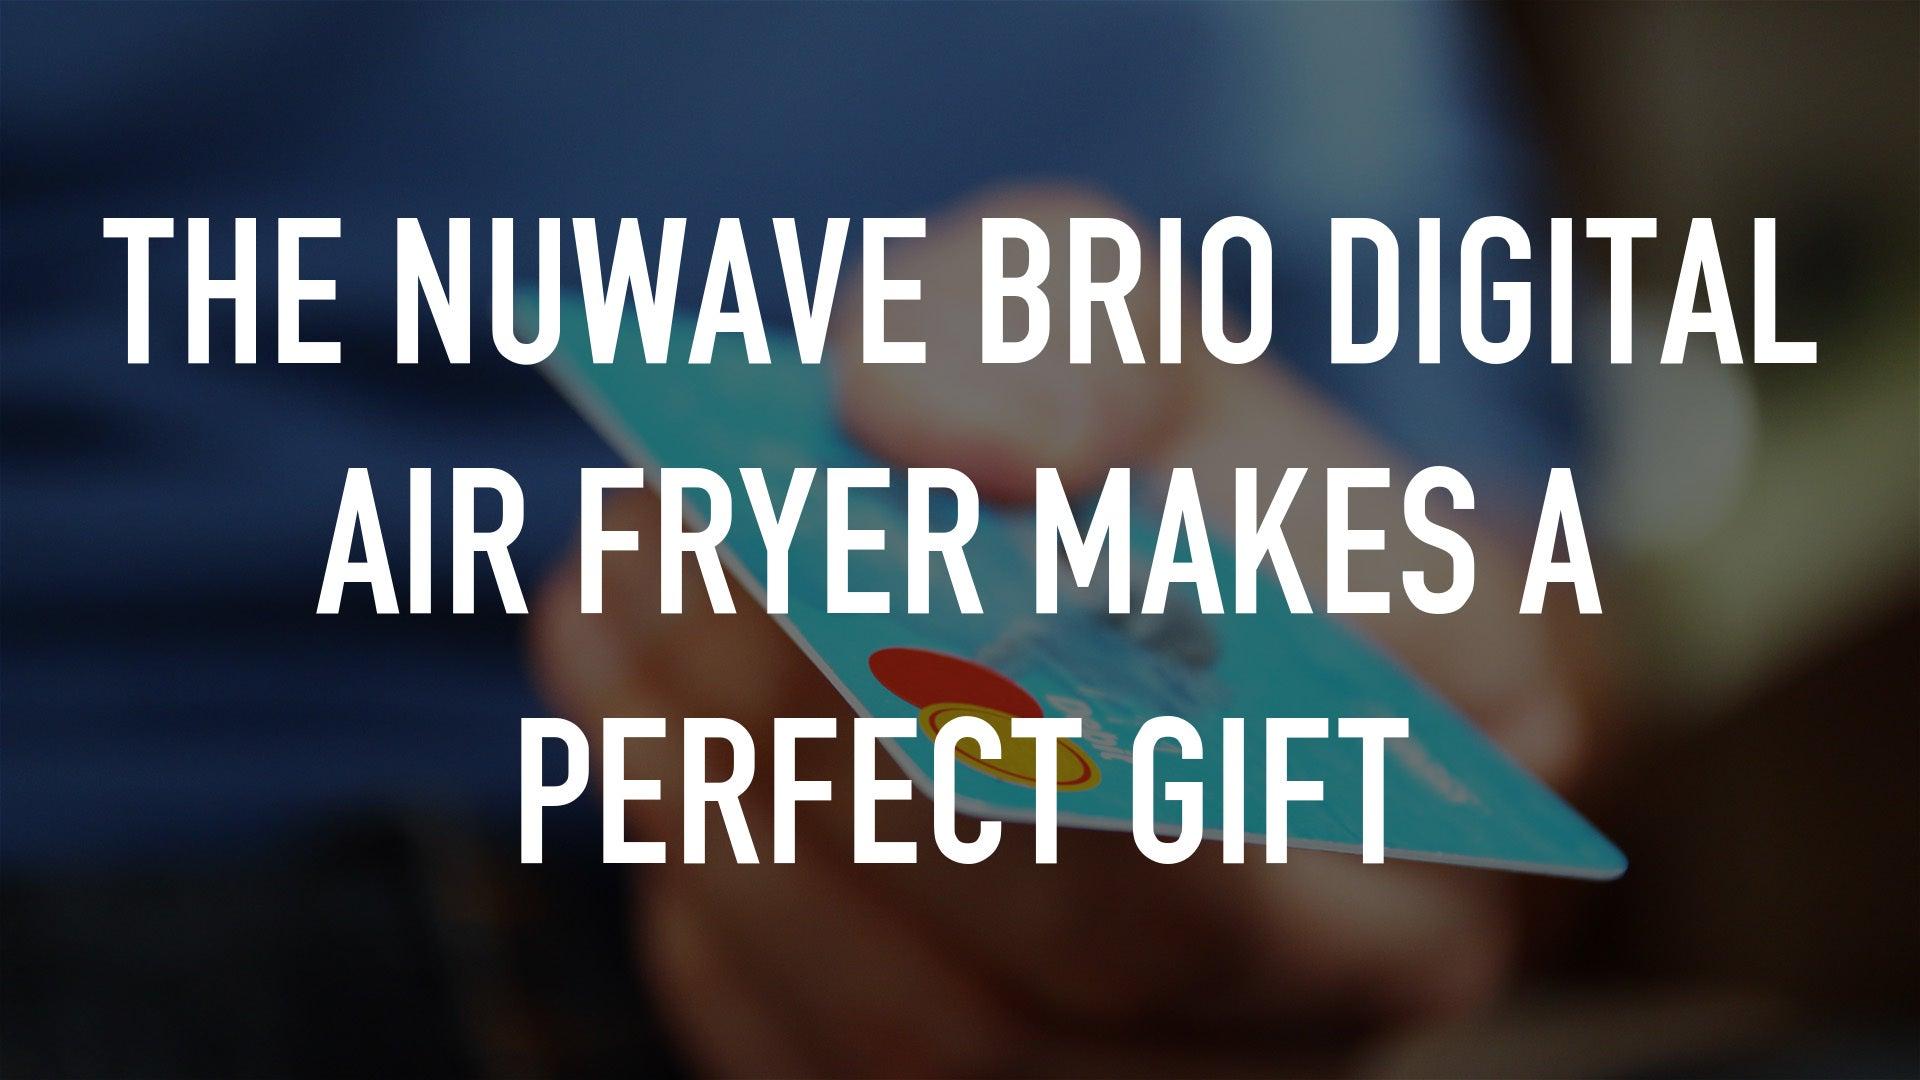 The NuWave Brio Digital Air Fryer Makes A Perfect Gift